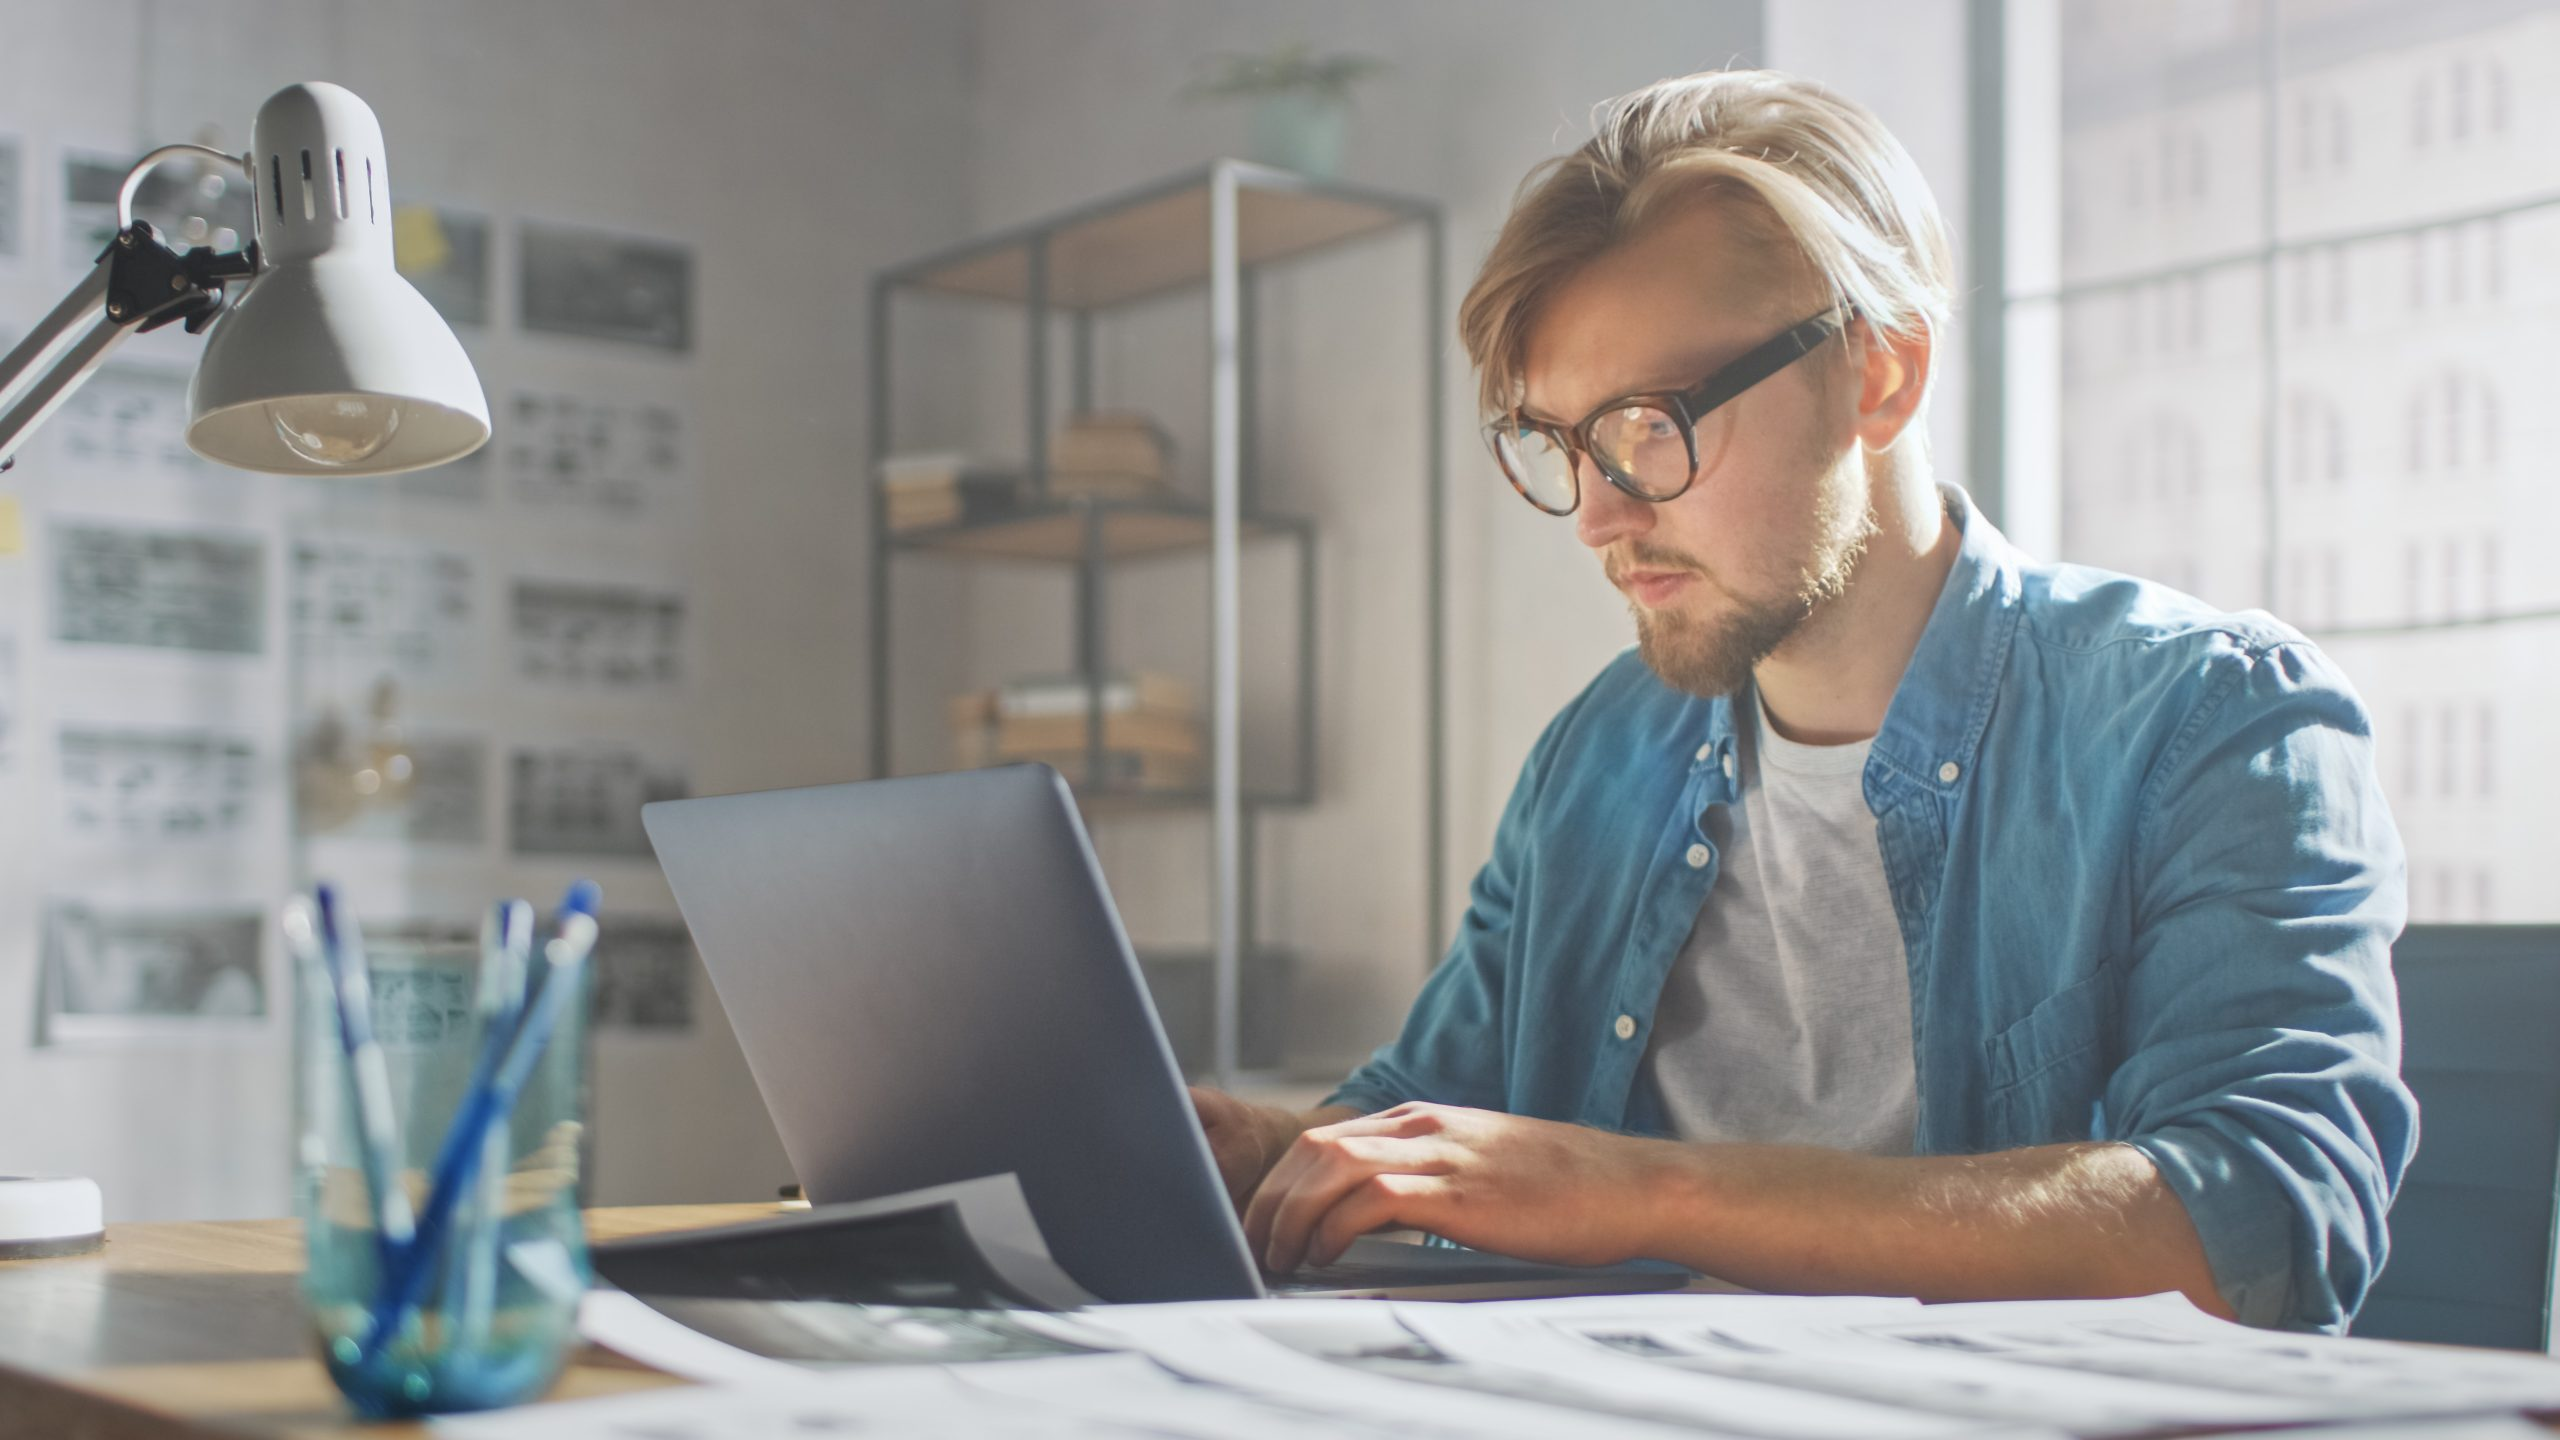 Homem usando vpn para trabalhar